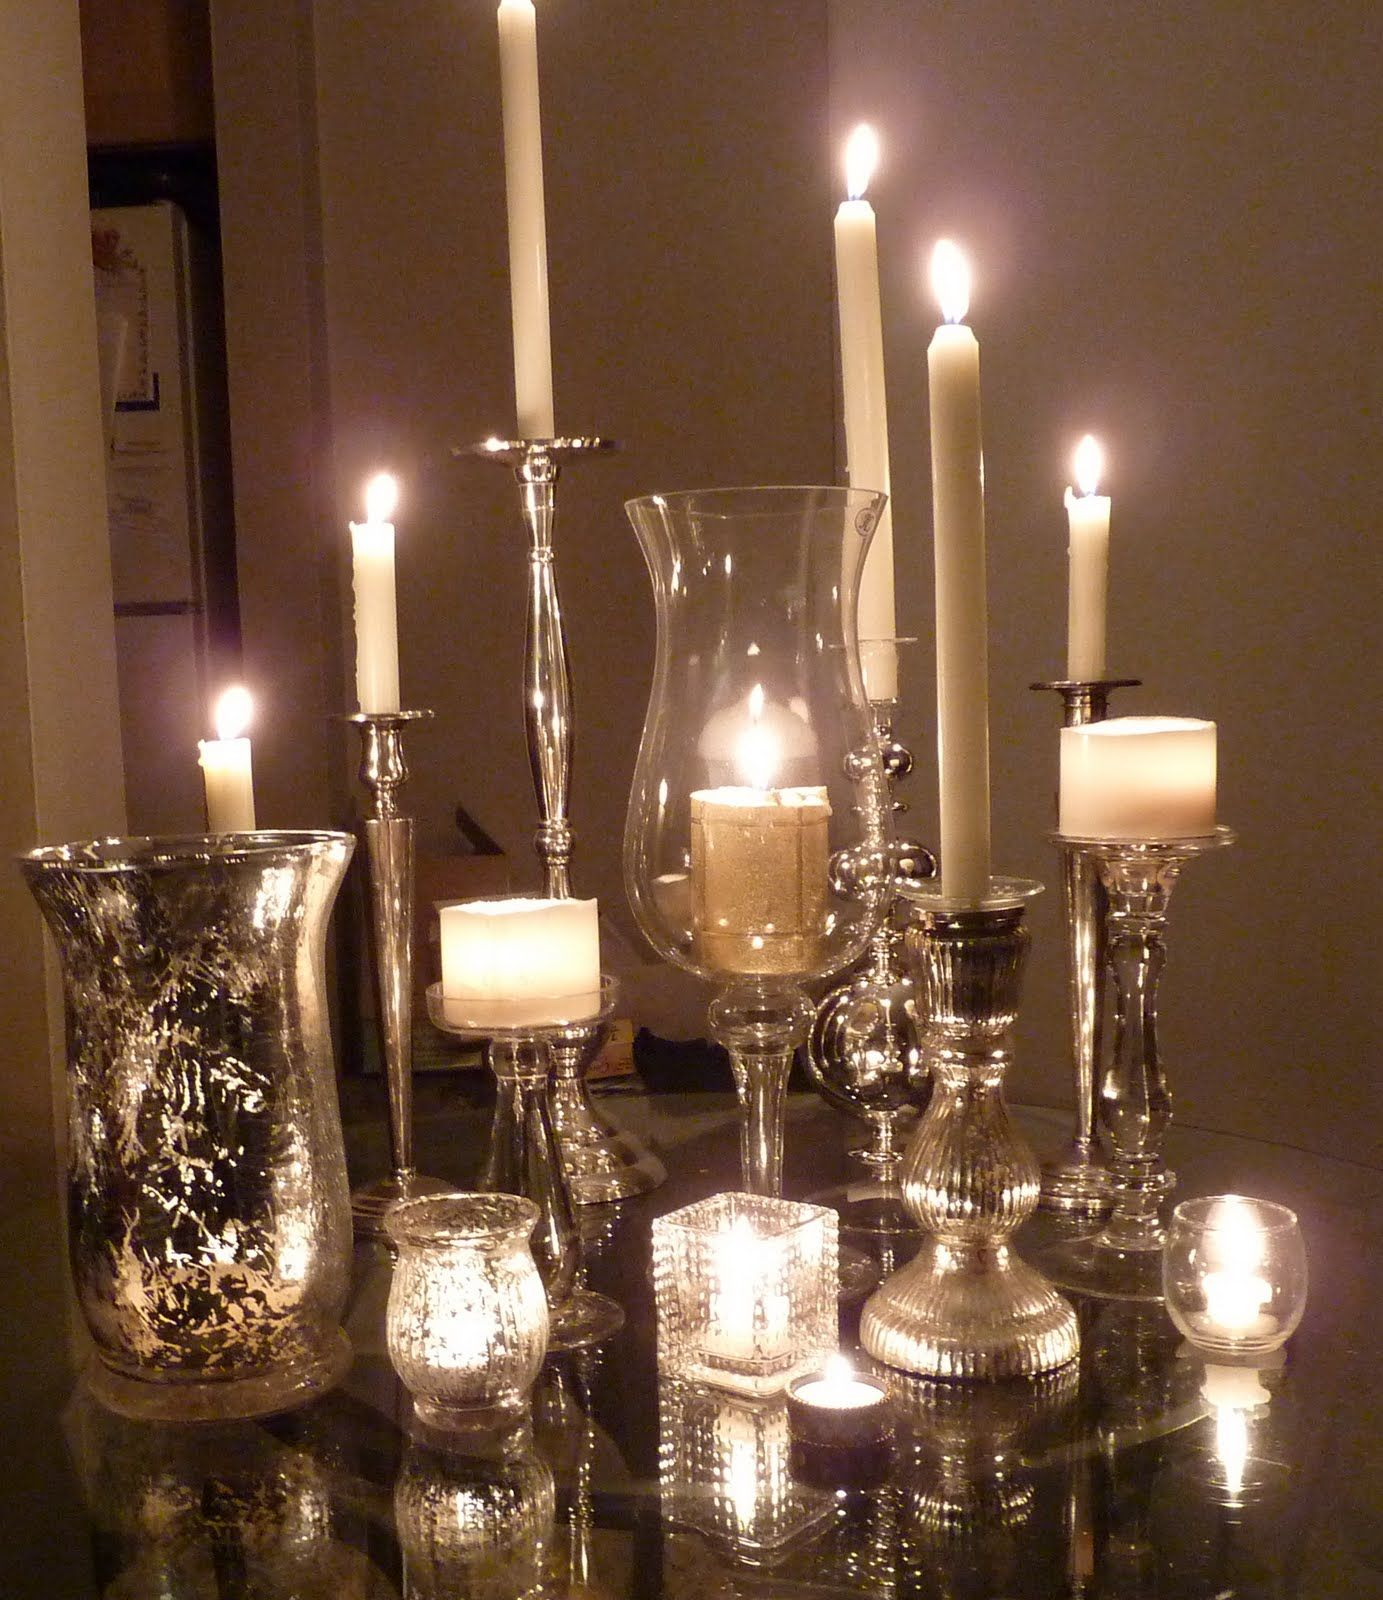 Mix and match mercury glass candle holders make a